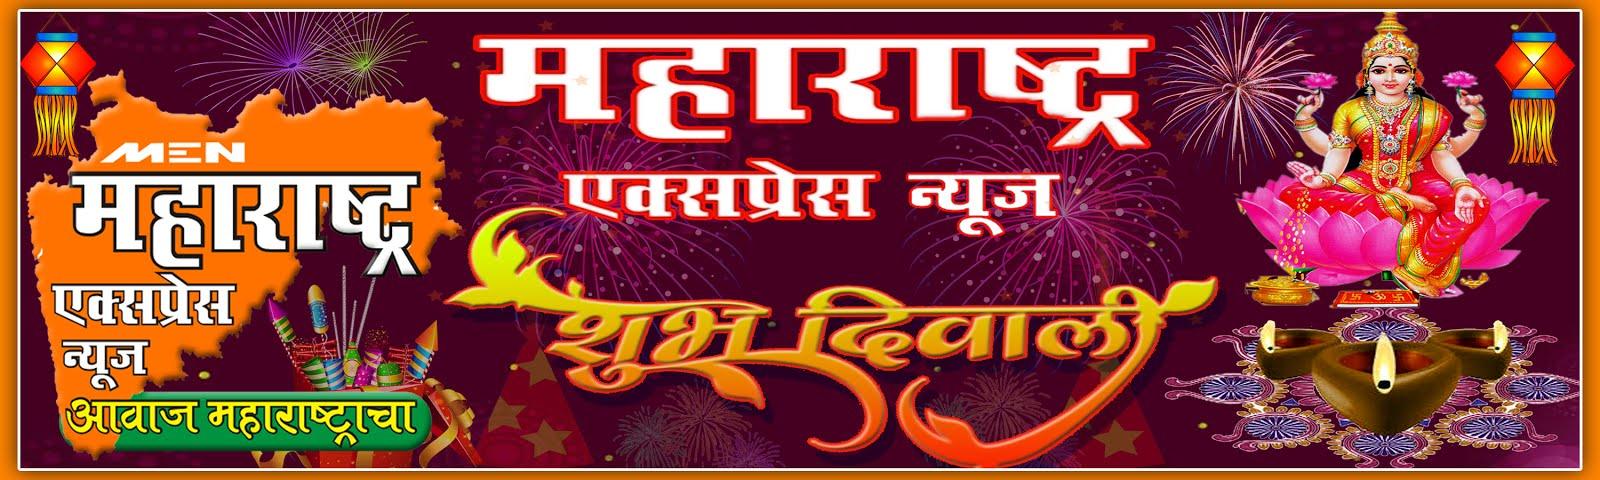 Maharashtra Express News :: Live News From Maharashtra, Mumbai, Pune, Nashik